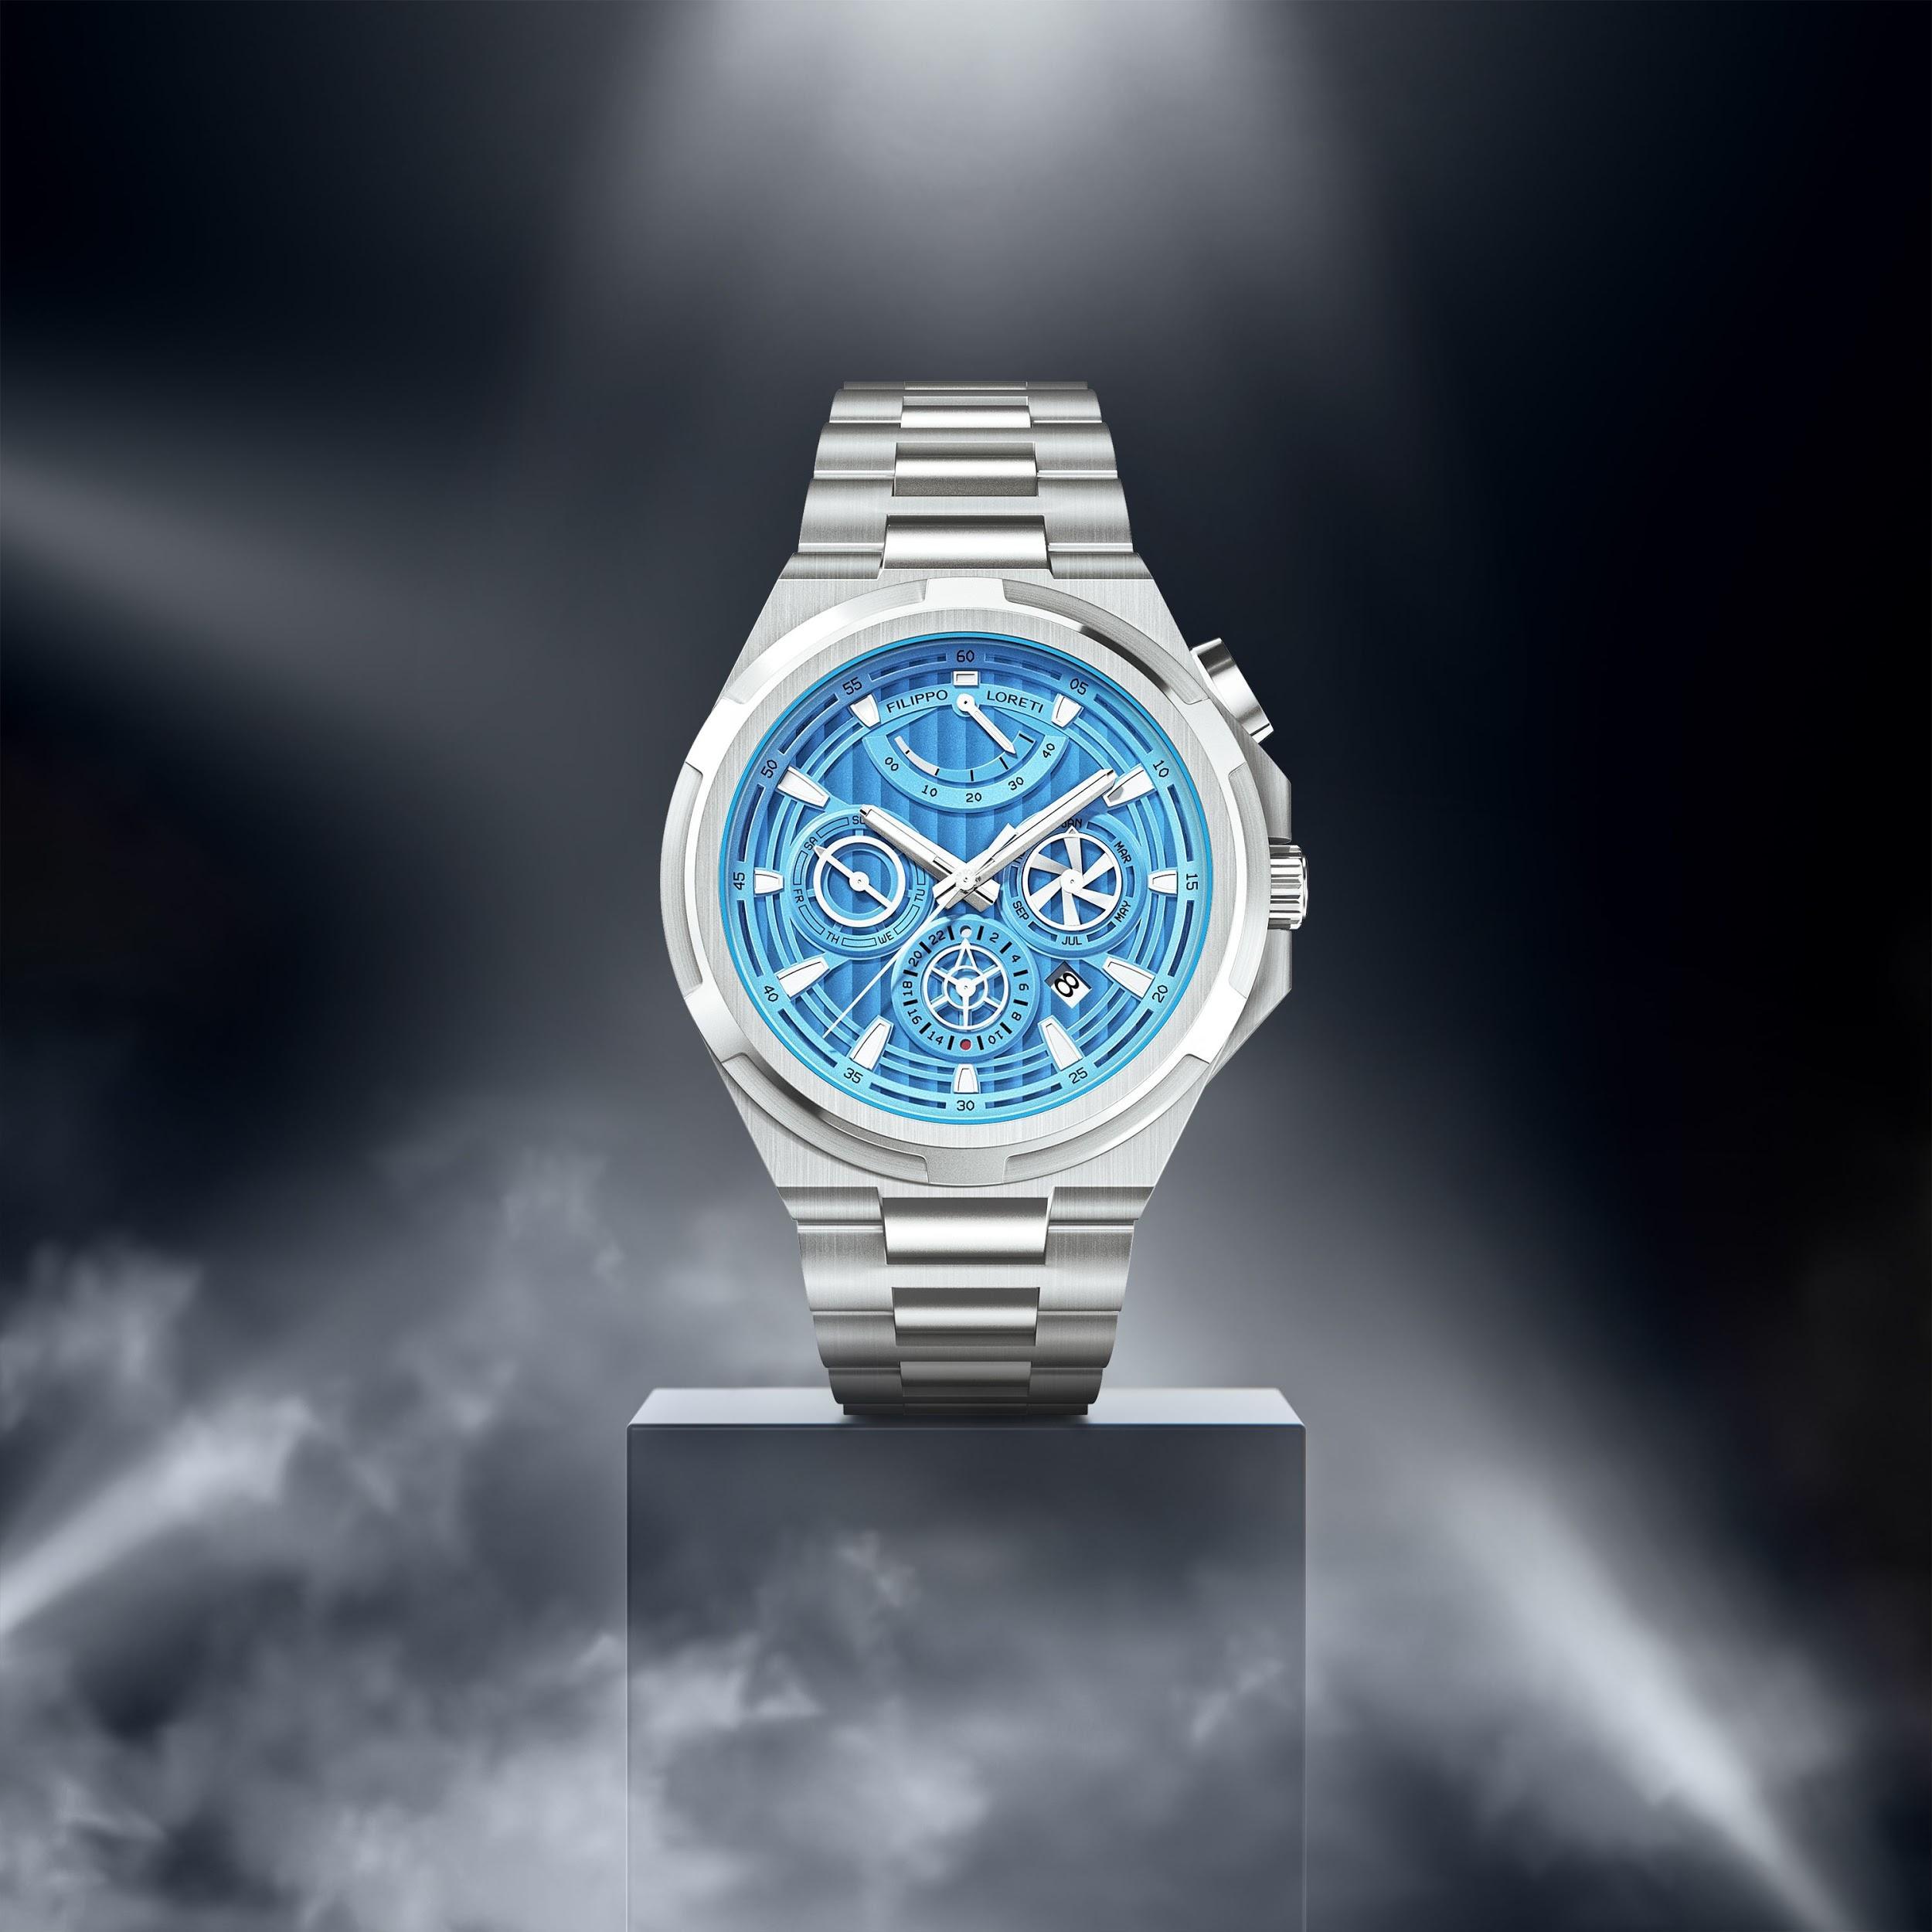 Arsenal Sky Blue Men's Watch from Filippo Loreti